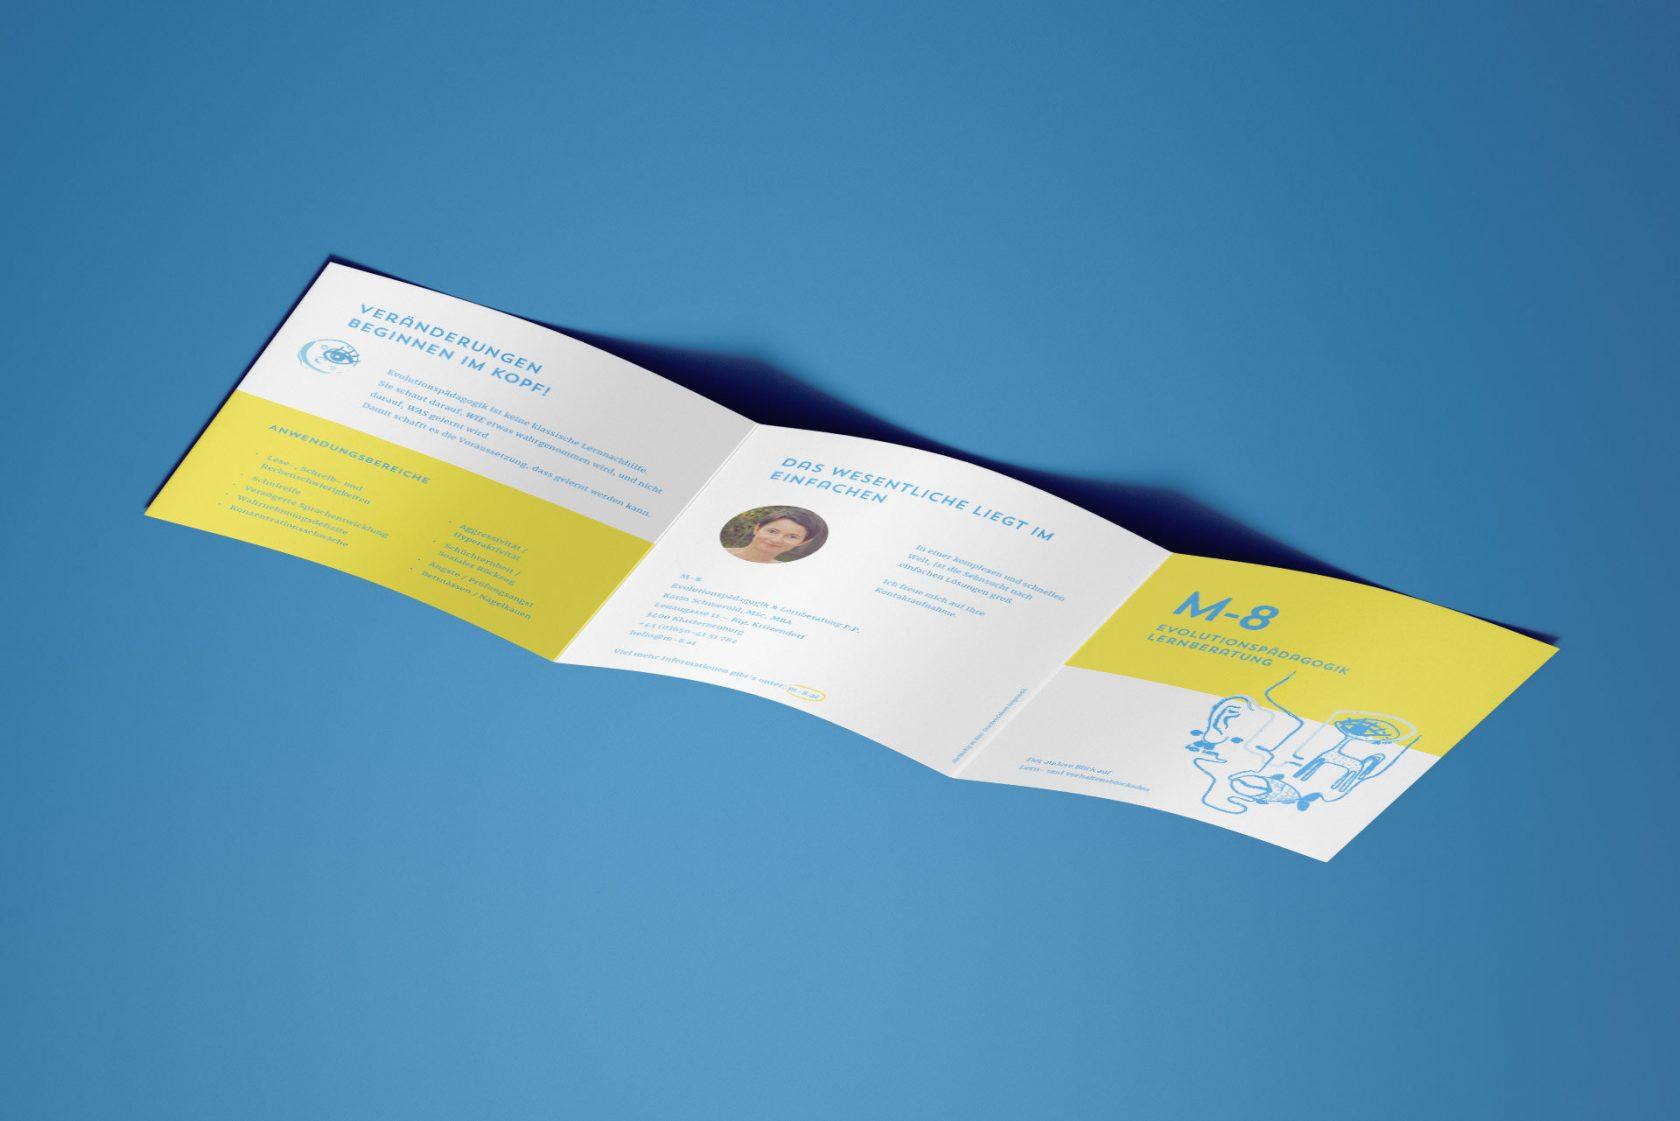 projekte_m-8-evolutionspaedagogik8-Folder